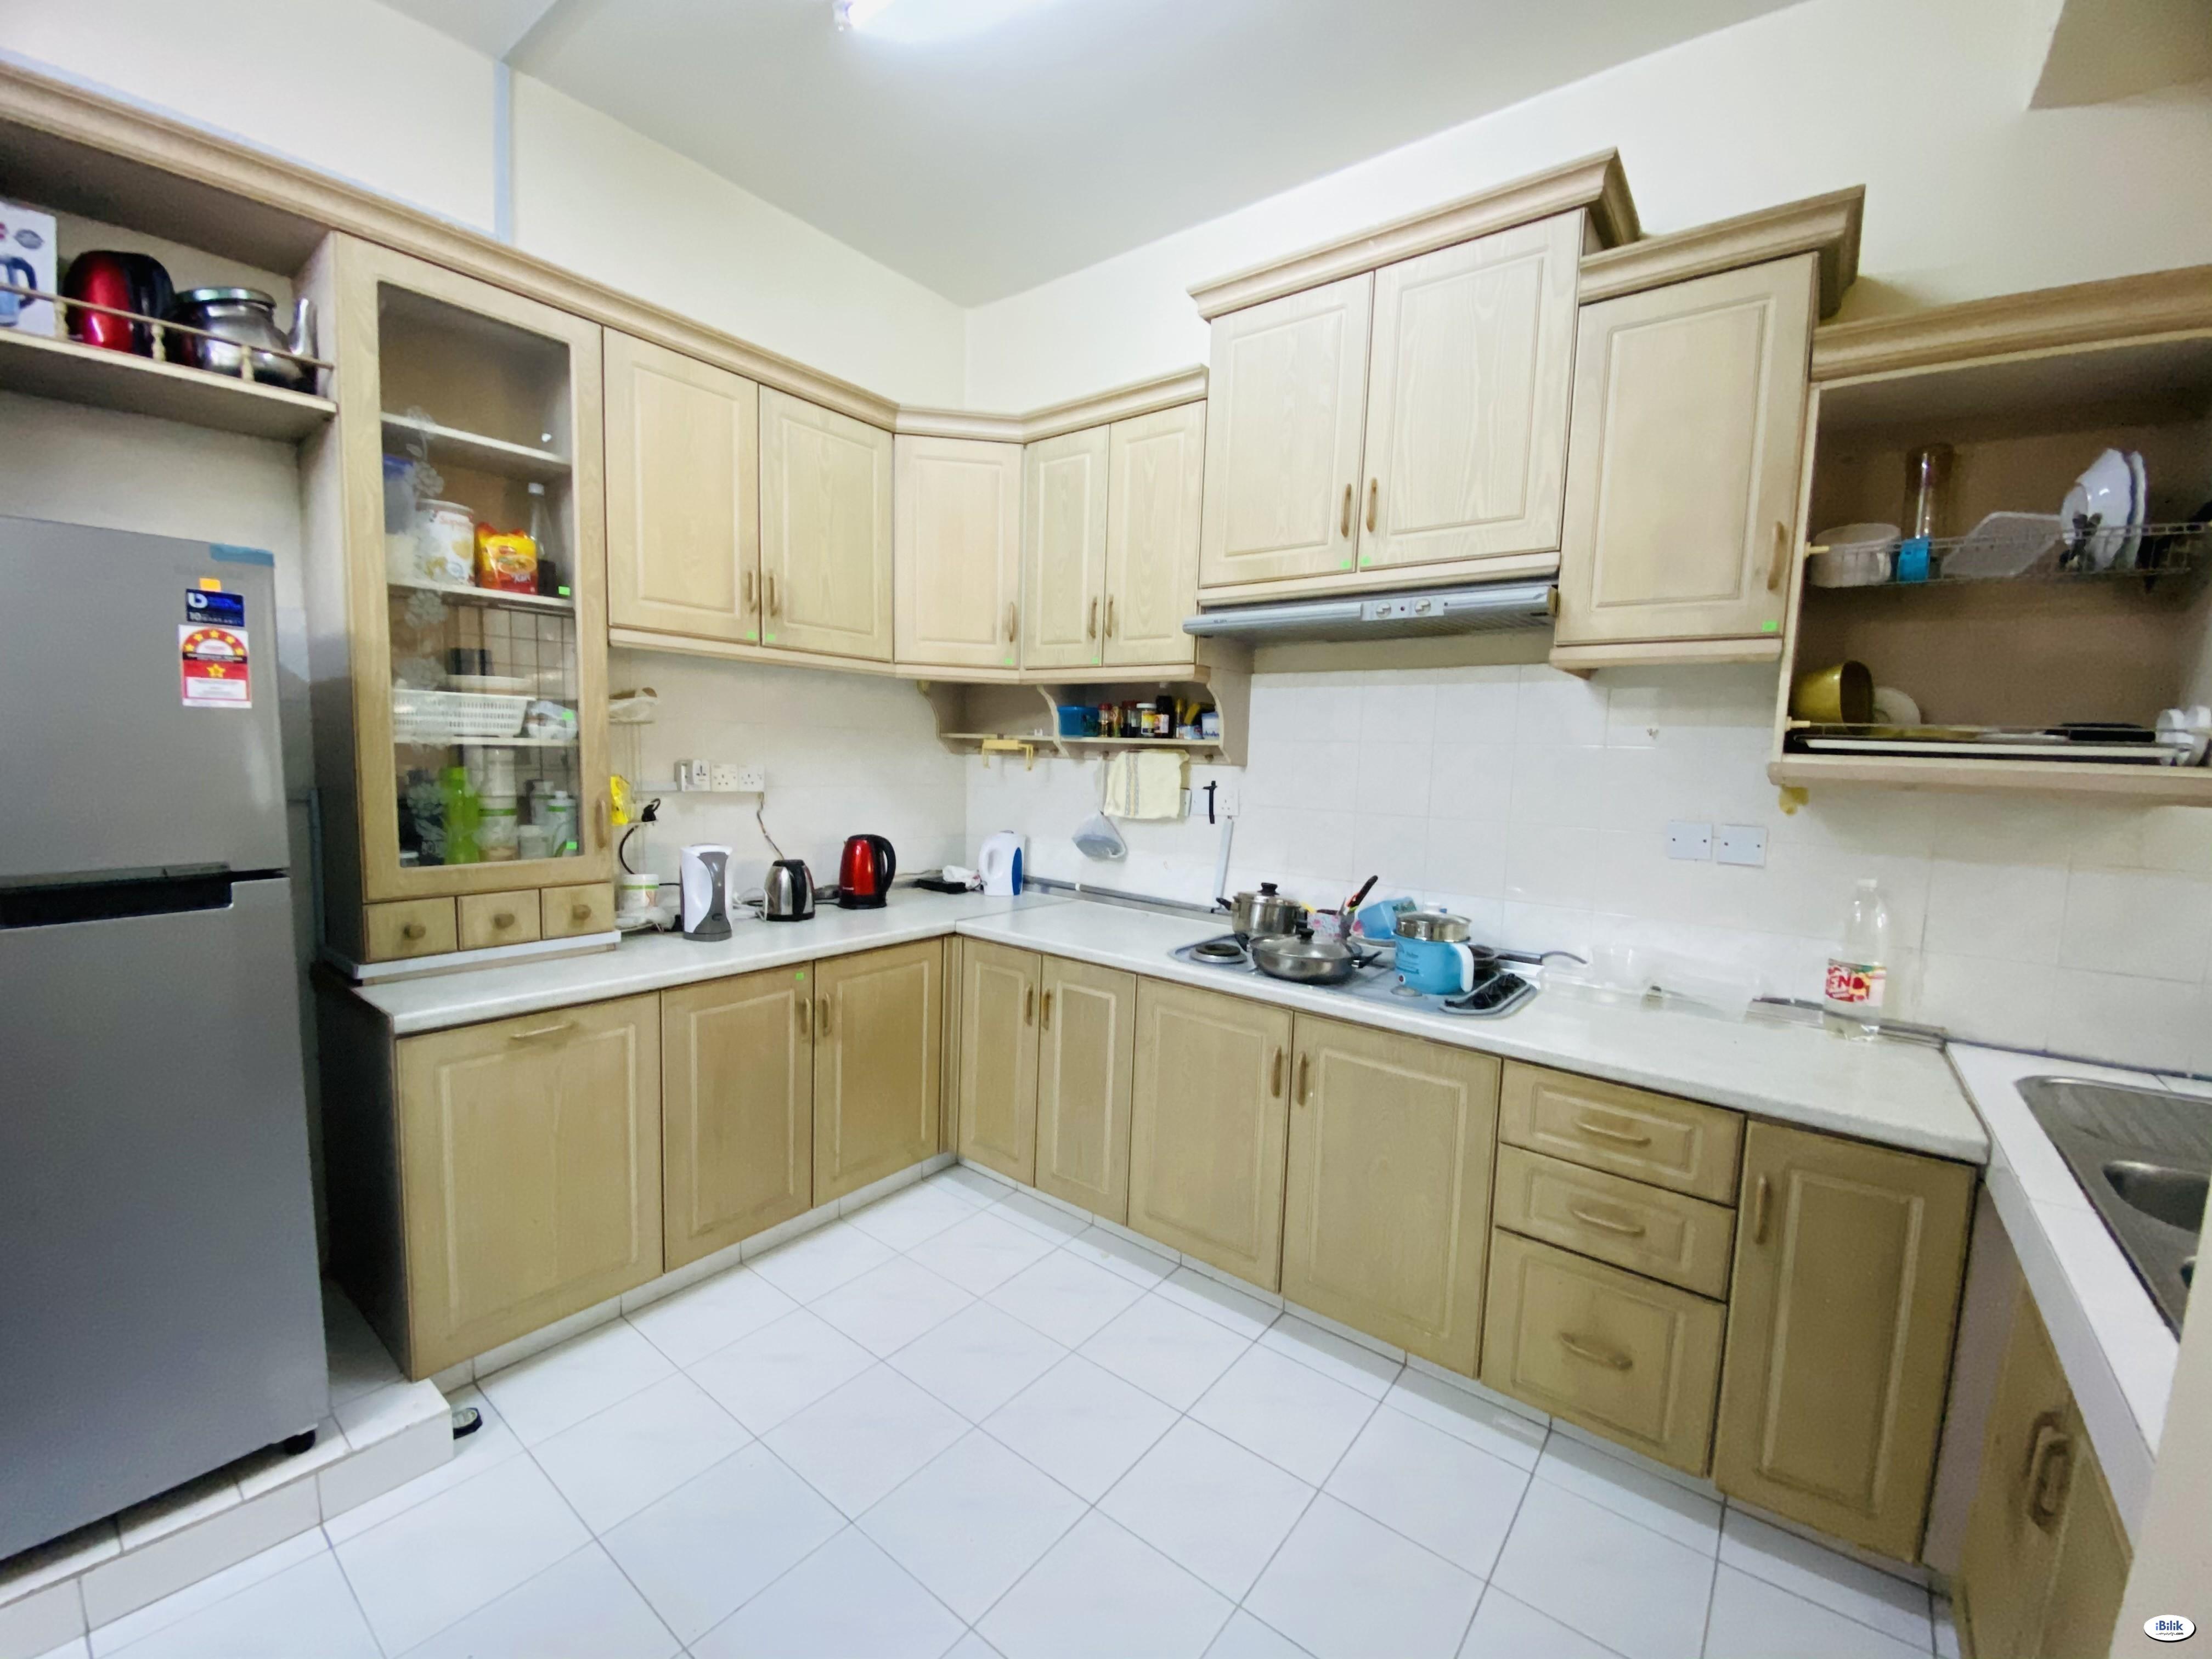 1+1 Depo 💥 Single Room at BU7, Bandar Utama, PJ Near Sunway Damansara, First City University